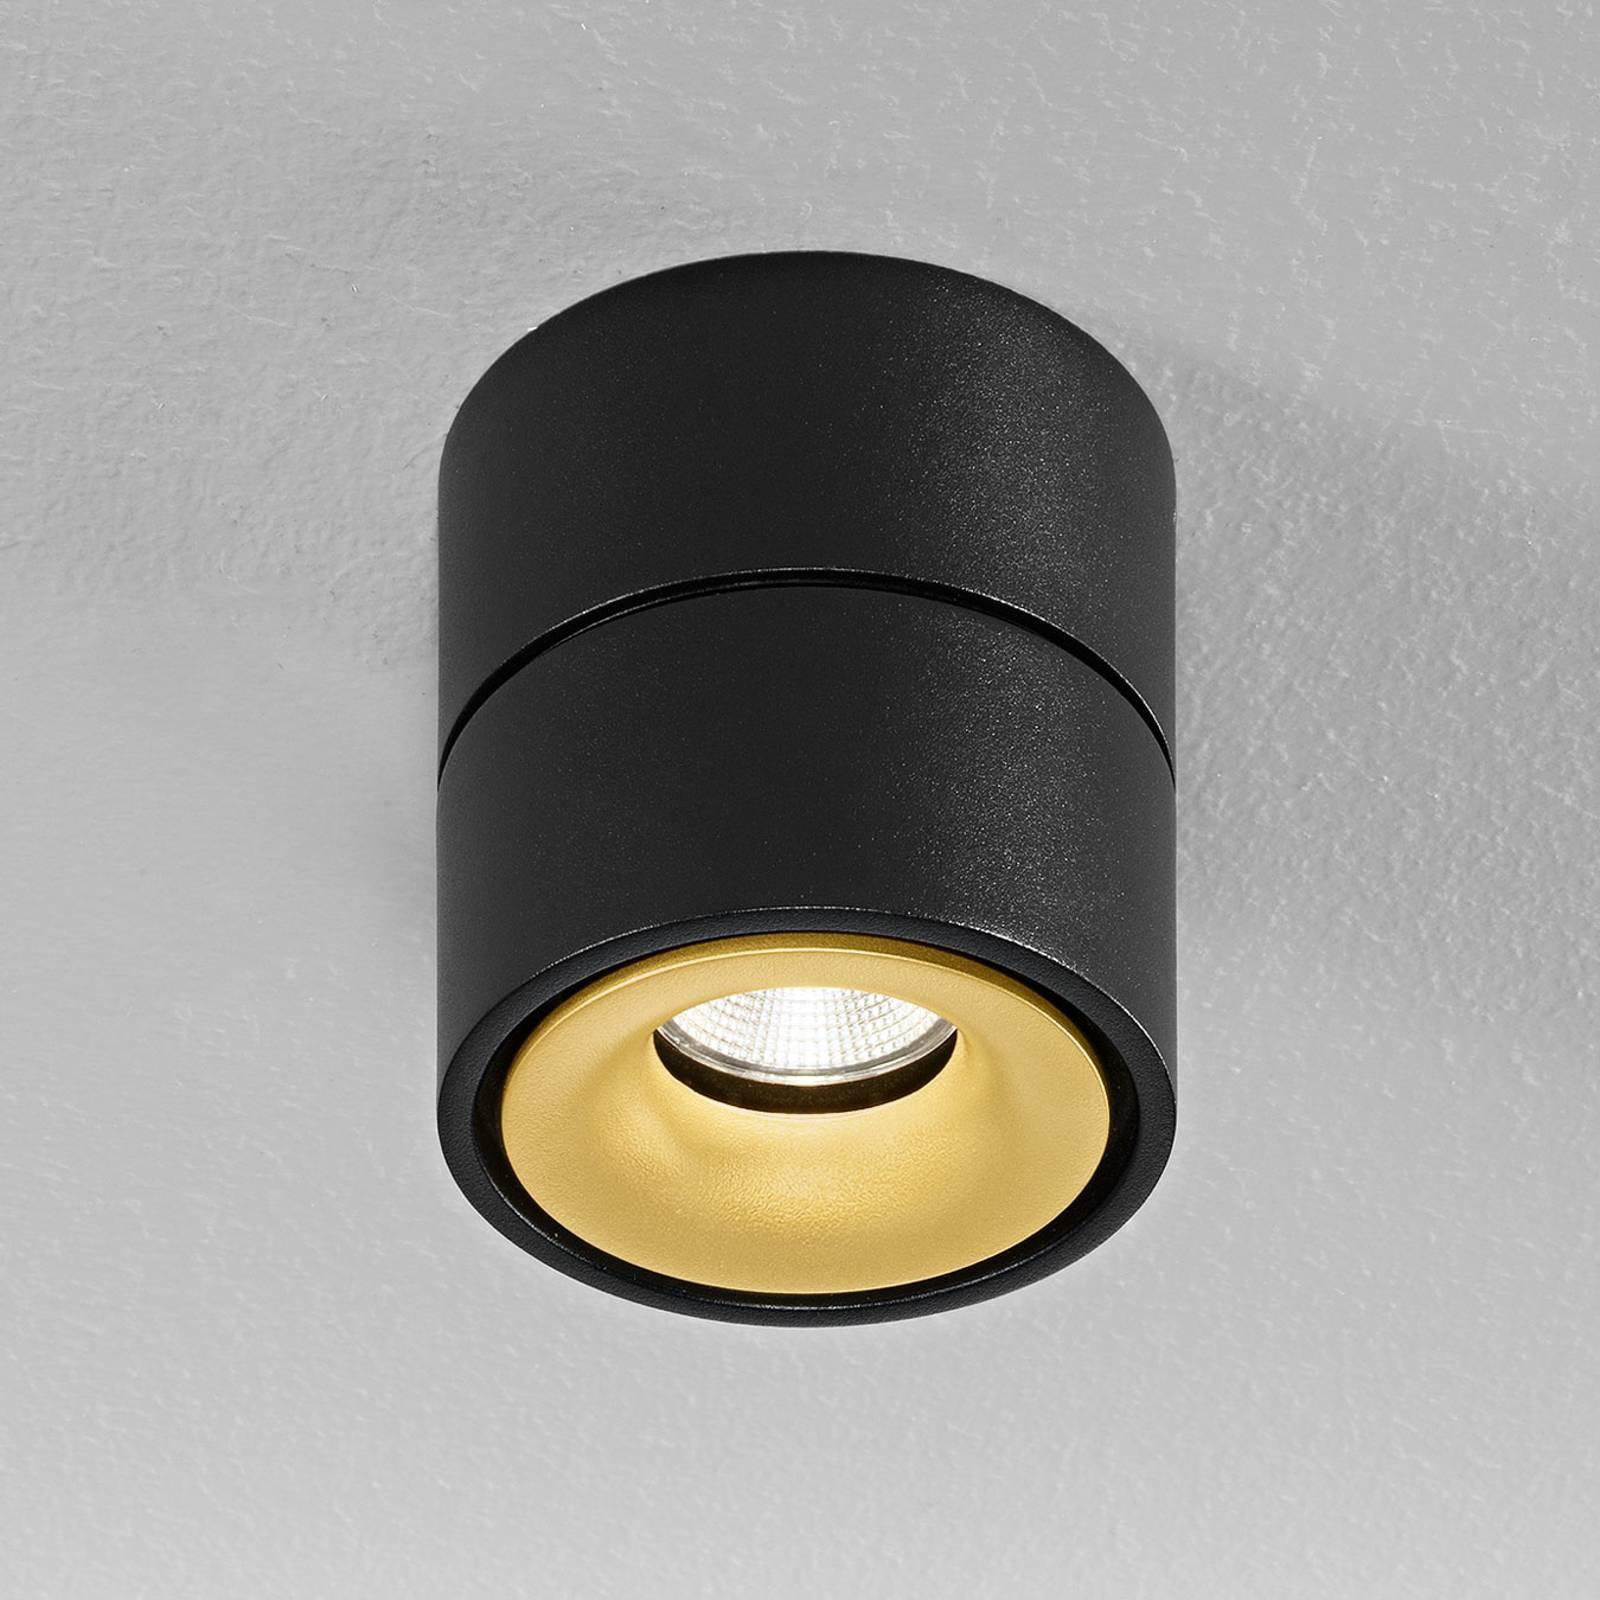 Egger Clippo spot LED soffitto, nero-oro, 2.700K